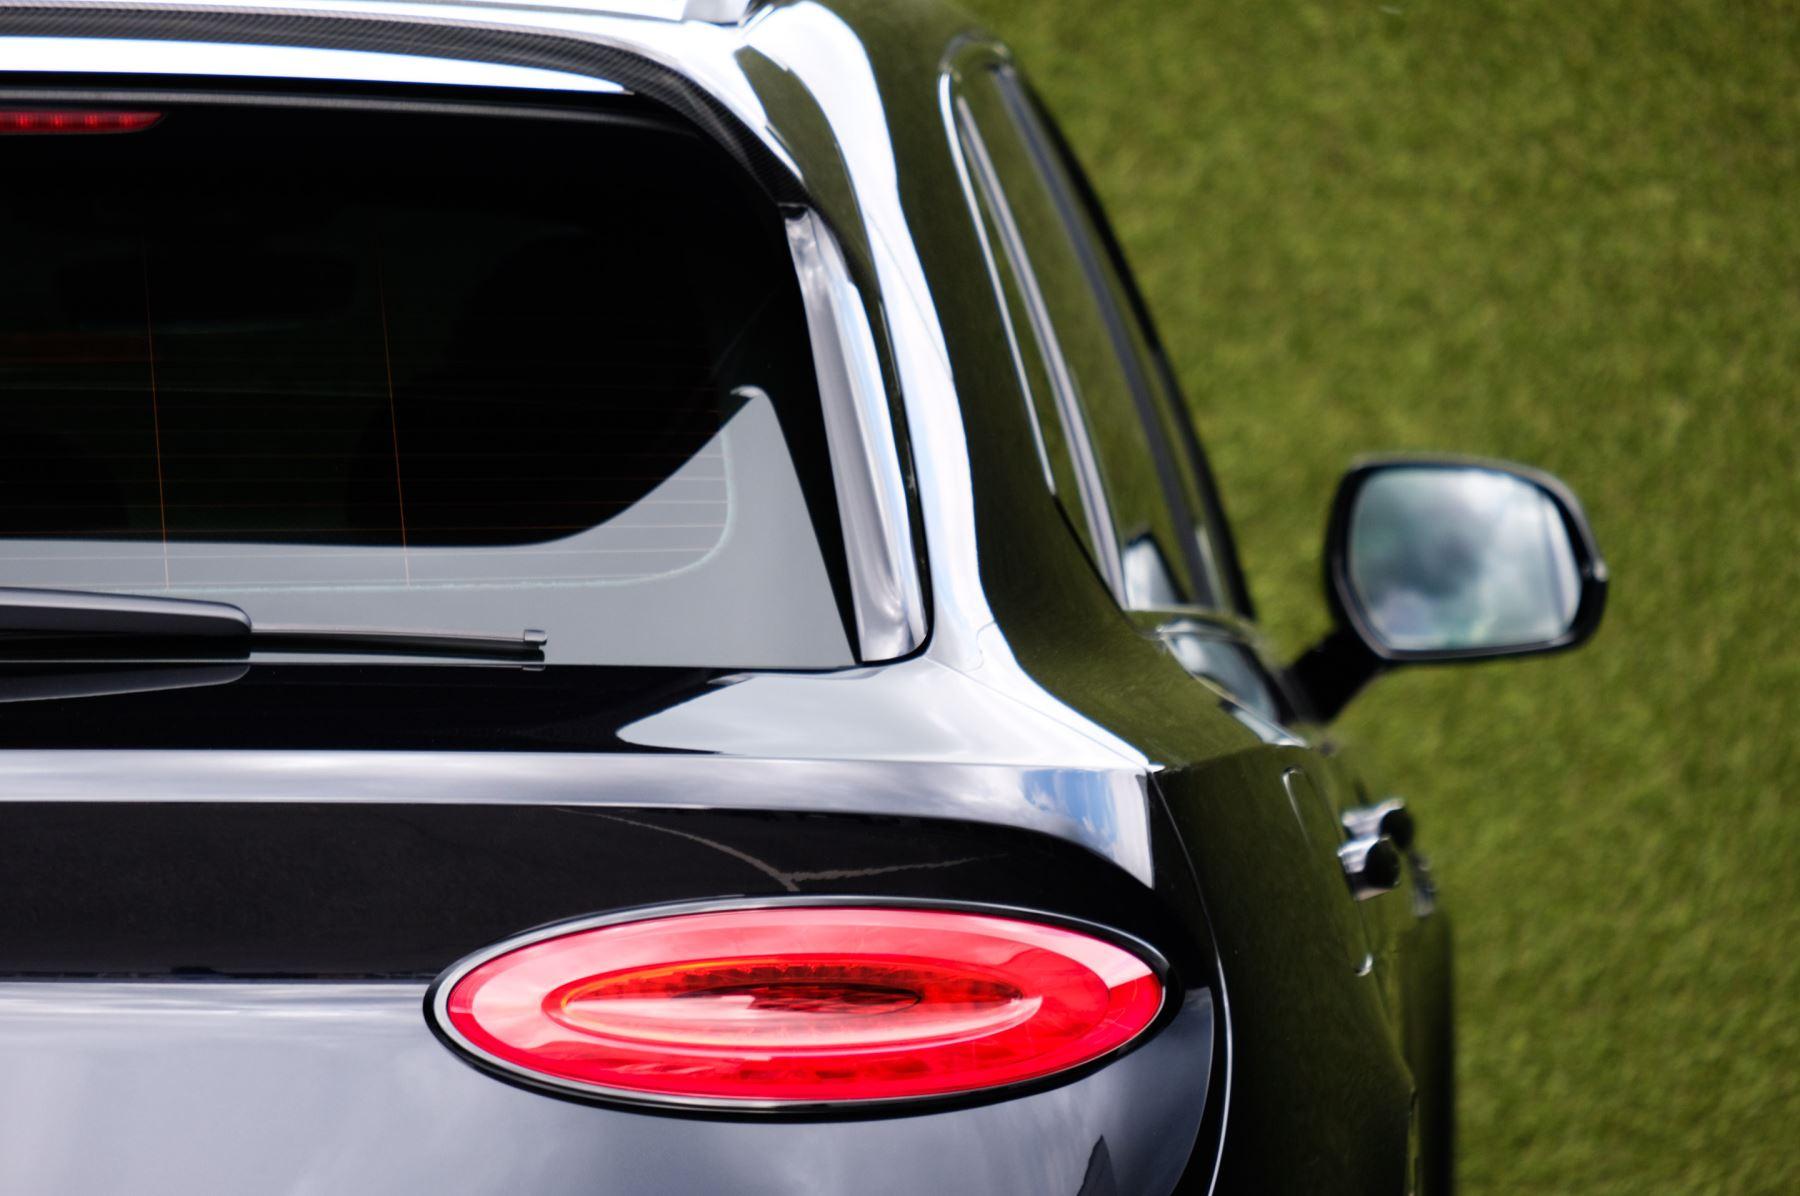 Bentley Bentayga 4.0 V8 - Mulliner Driving Specification for Black Specification image 8